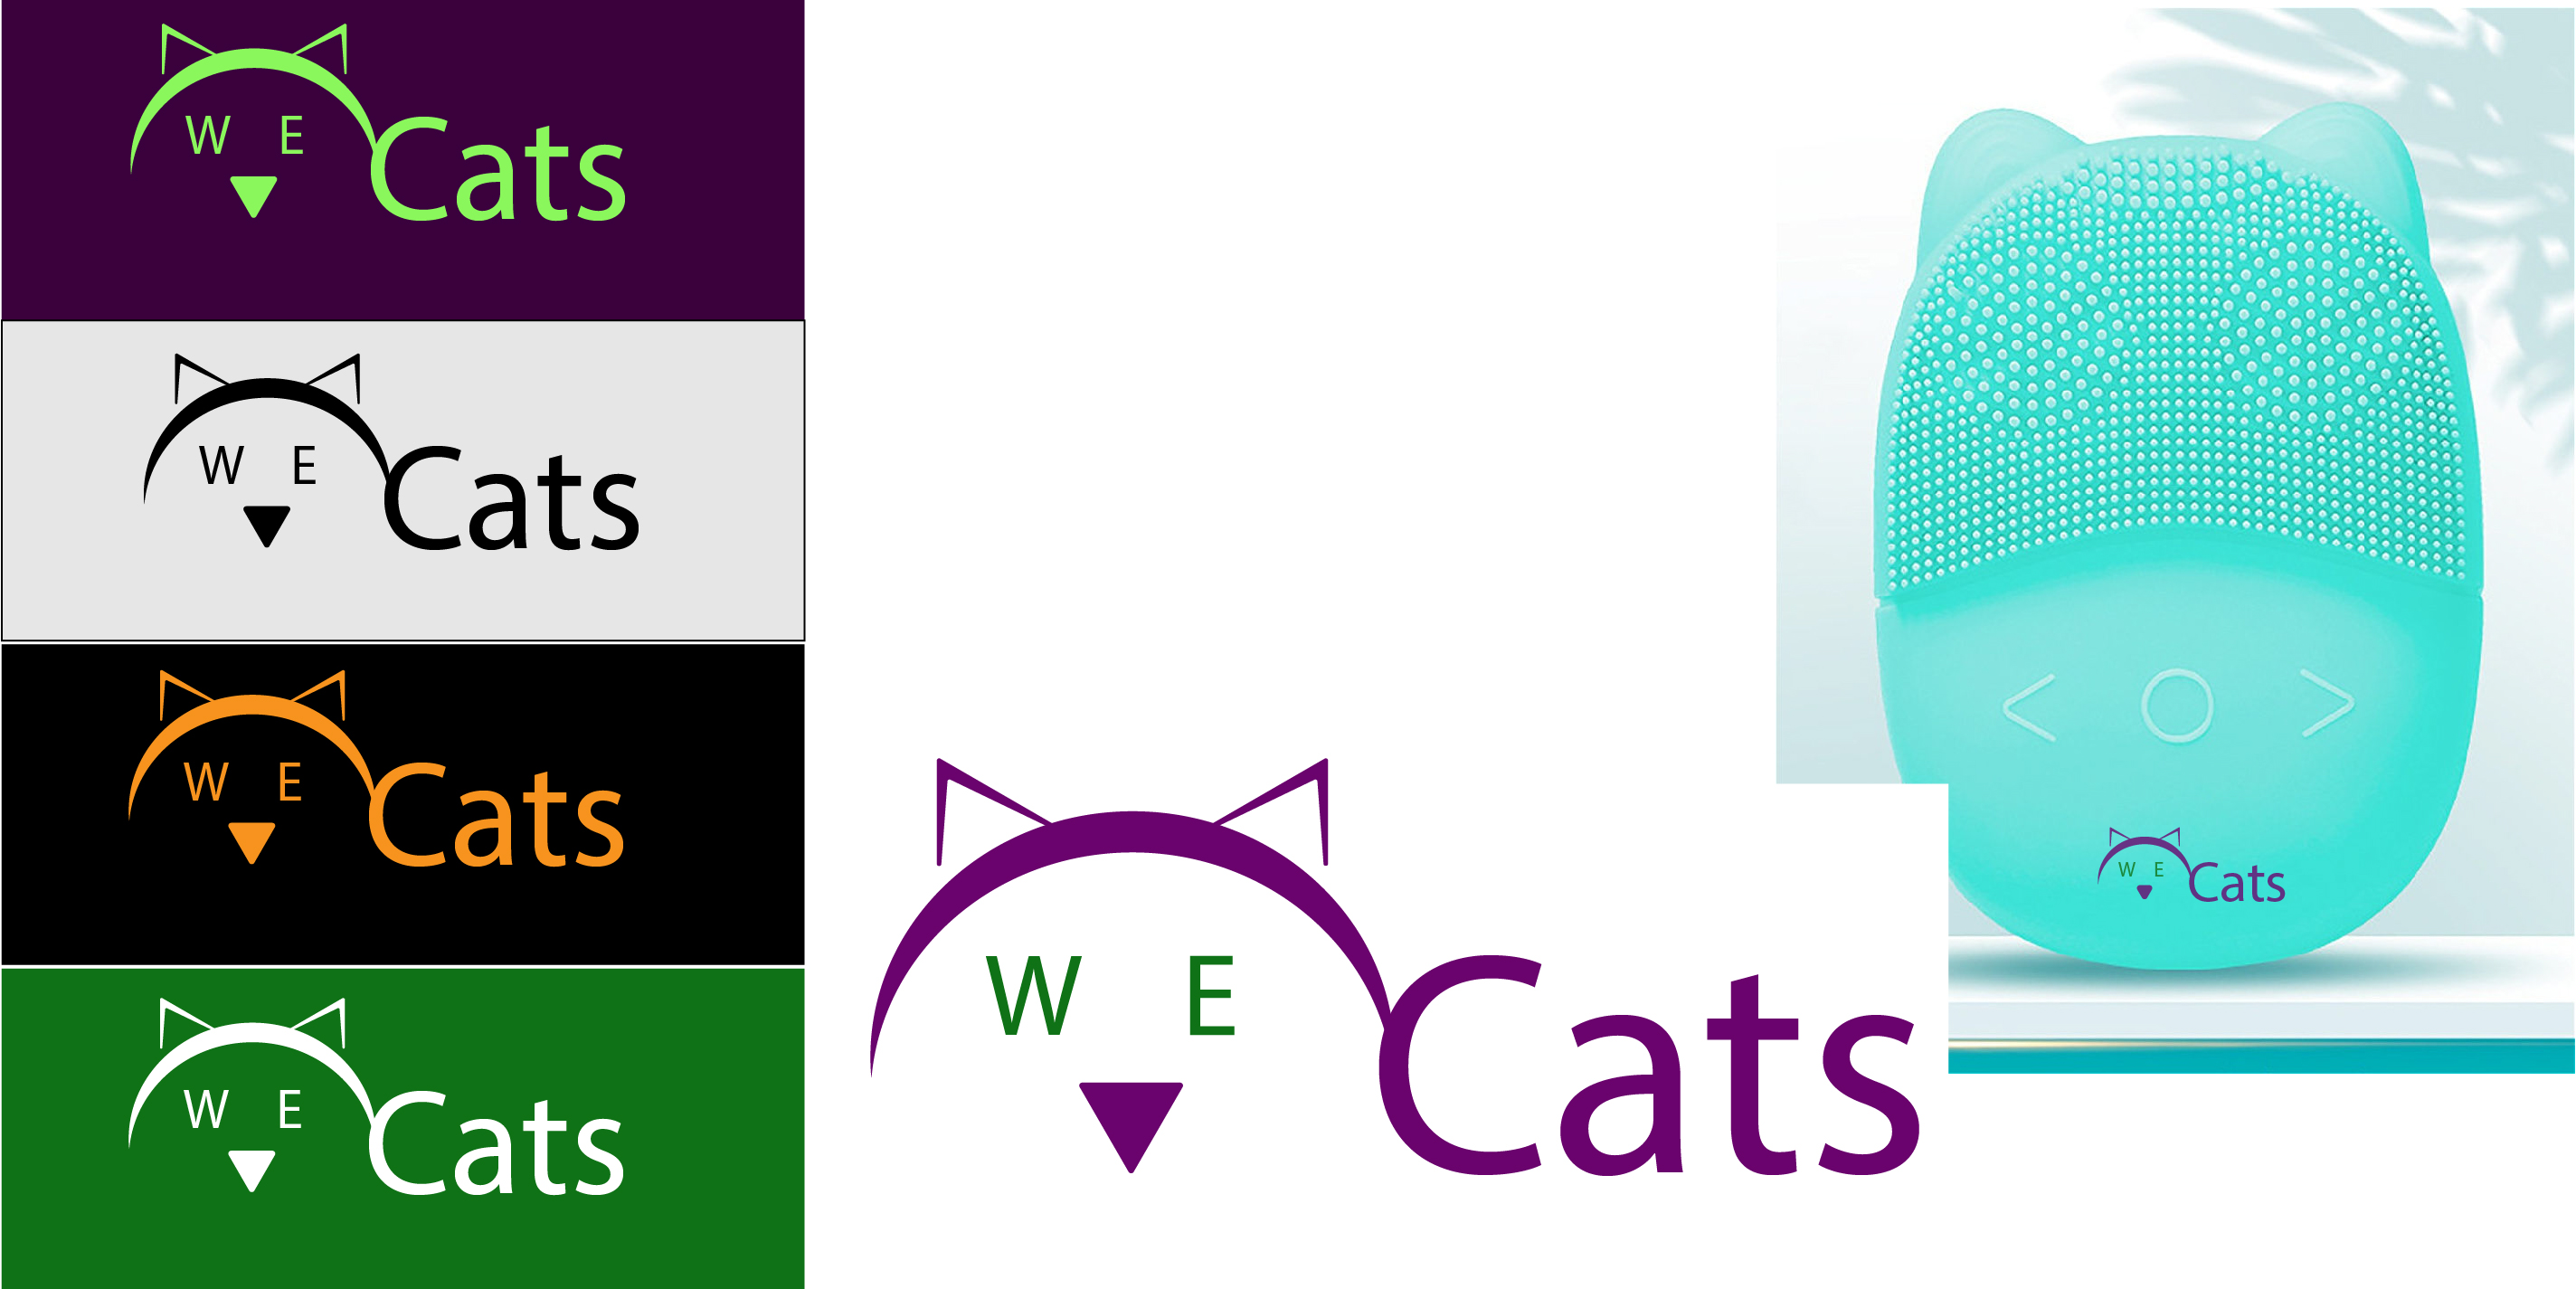 Создание логотипа WeCats фото f_8755f1ccdd7b0385.jpg